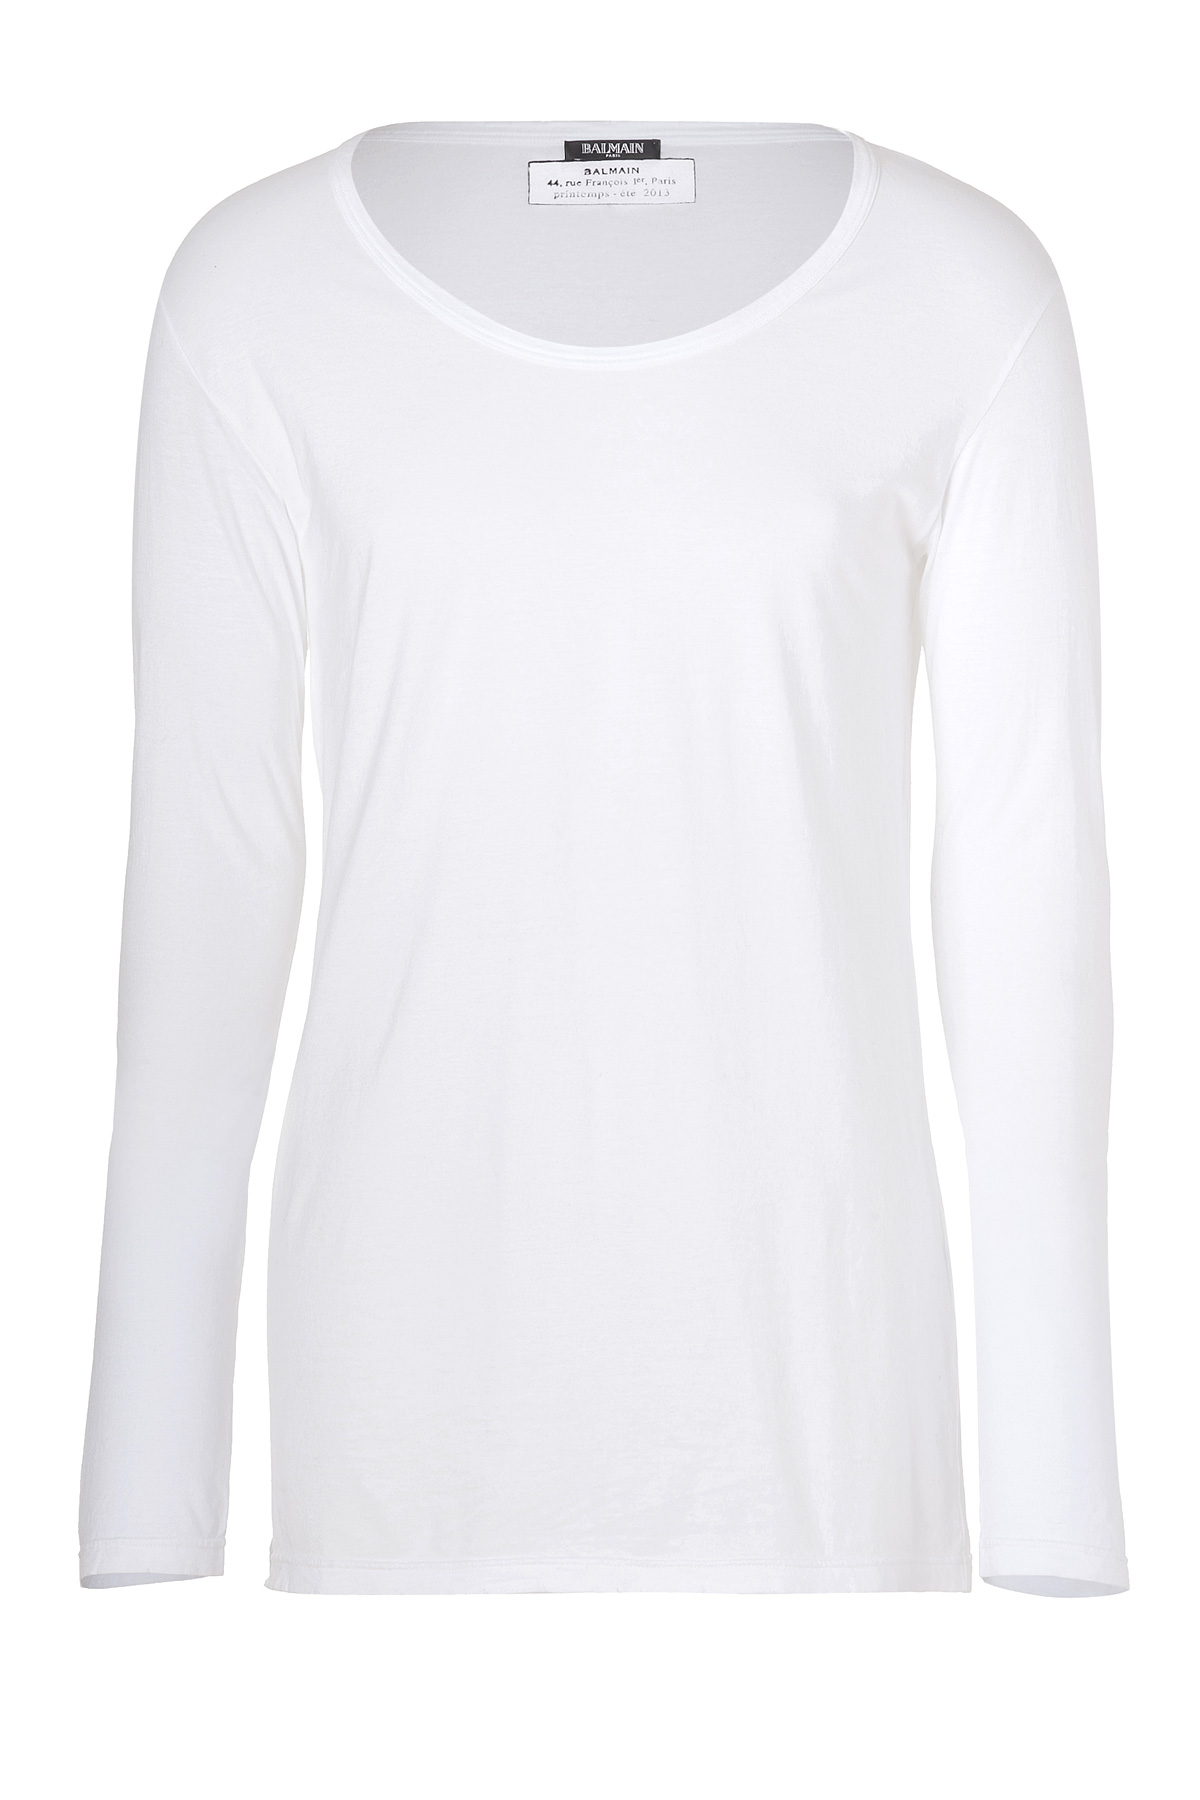 Balmain White Cotton Scoop Neck T Shirt In White For Men